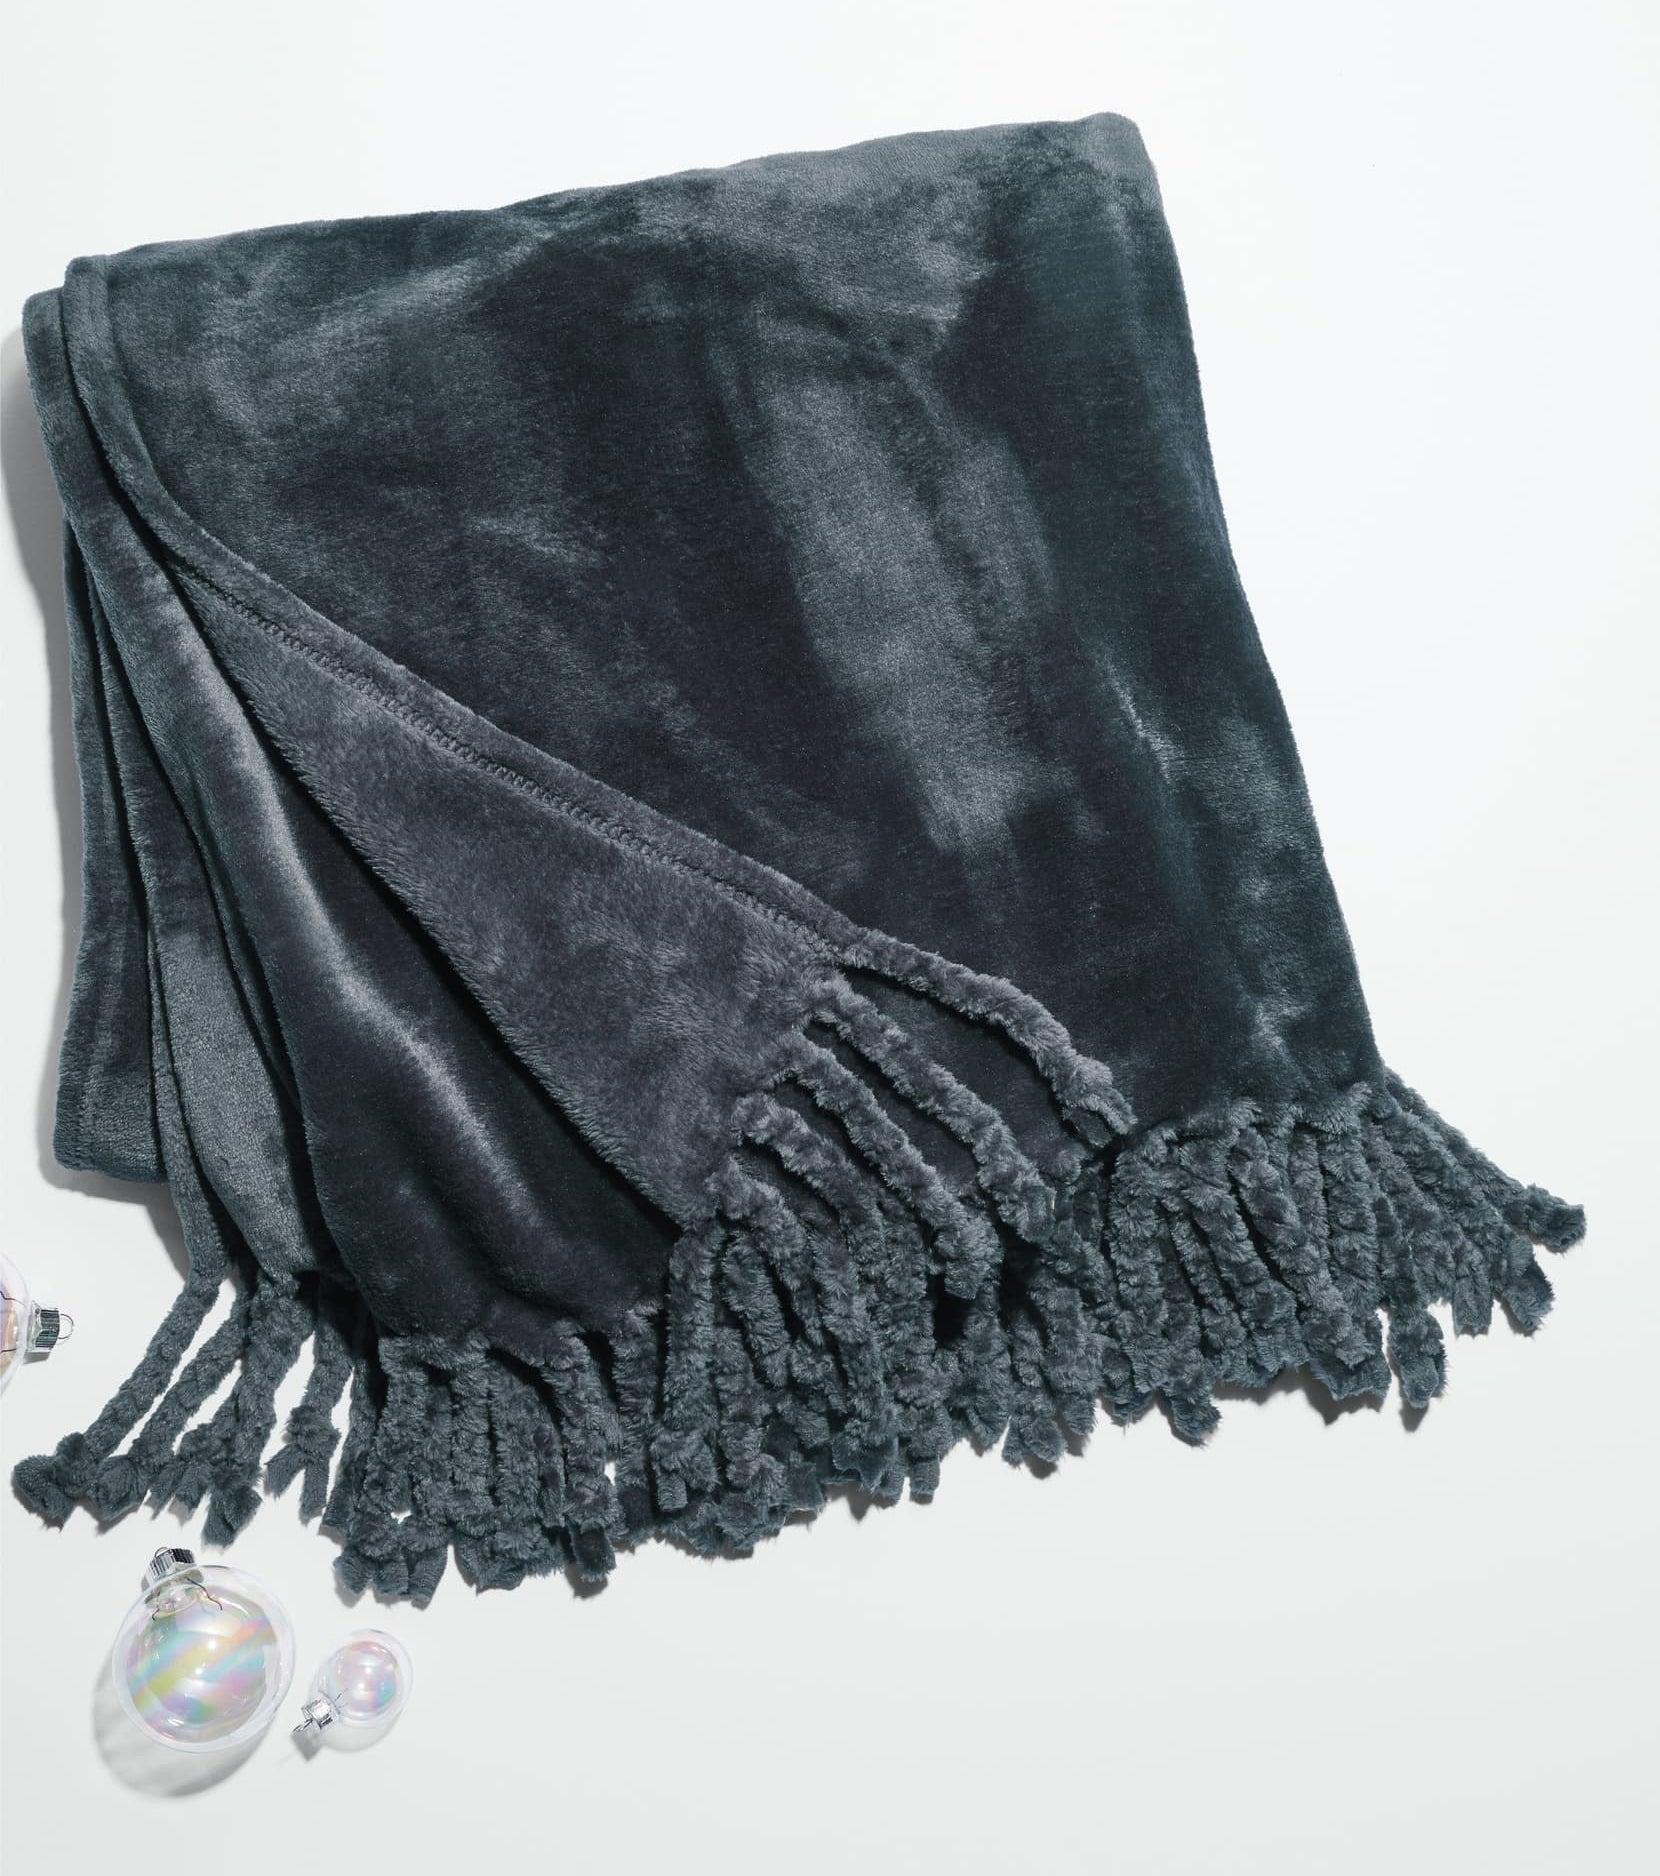 plush looking blanket with tassel trim